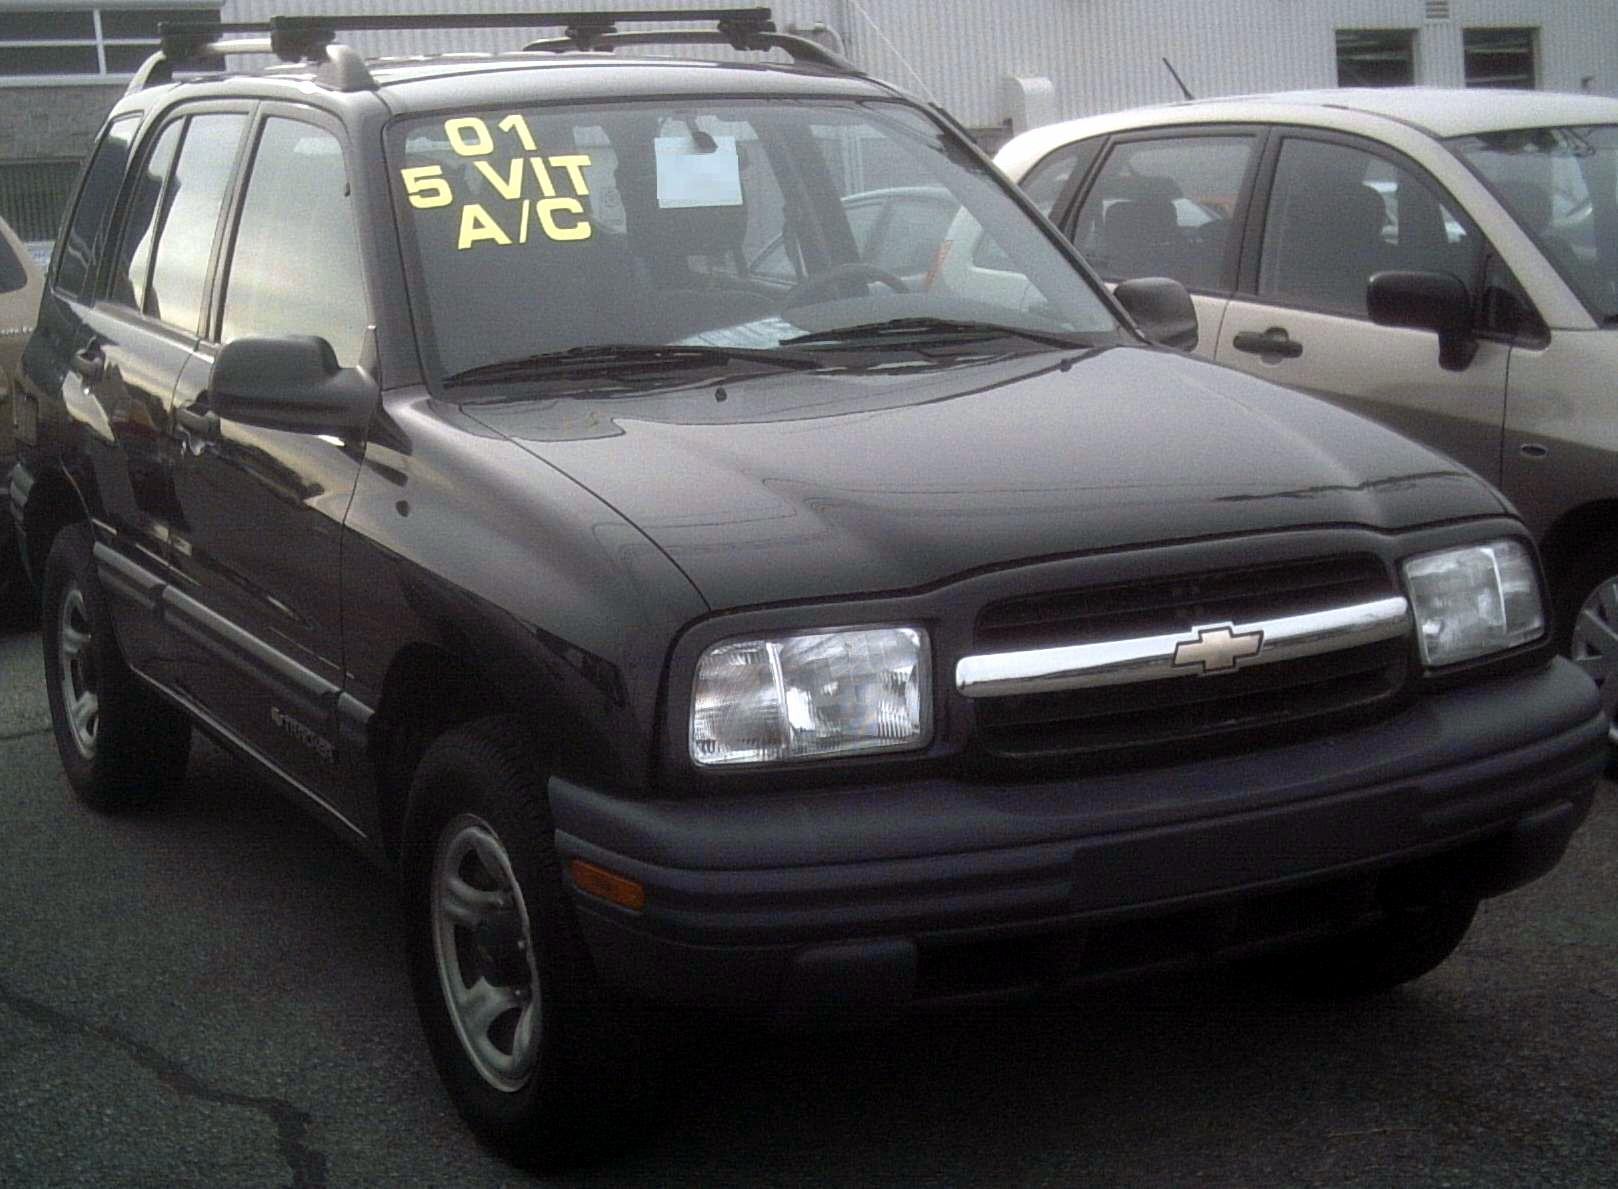 2001 Chevrolet Tracker #19 Chevrolet Tracker #19